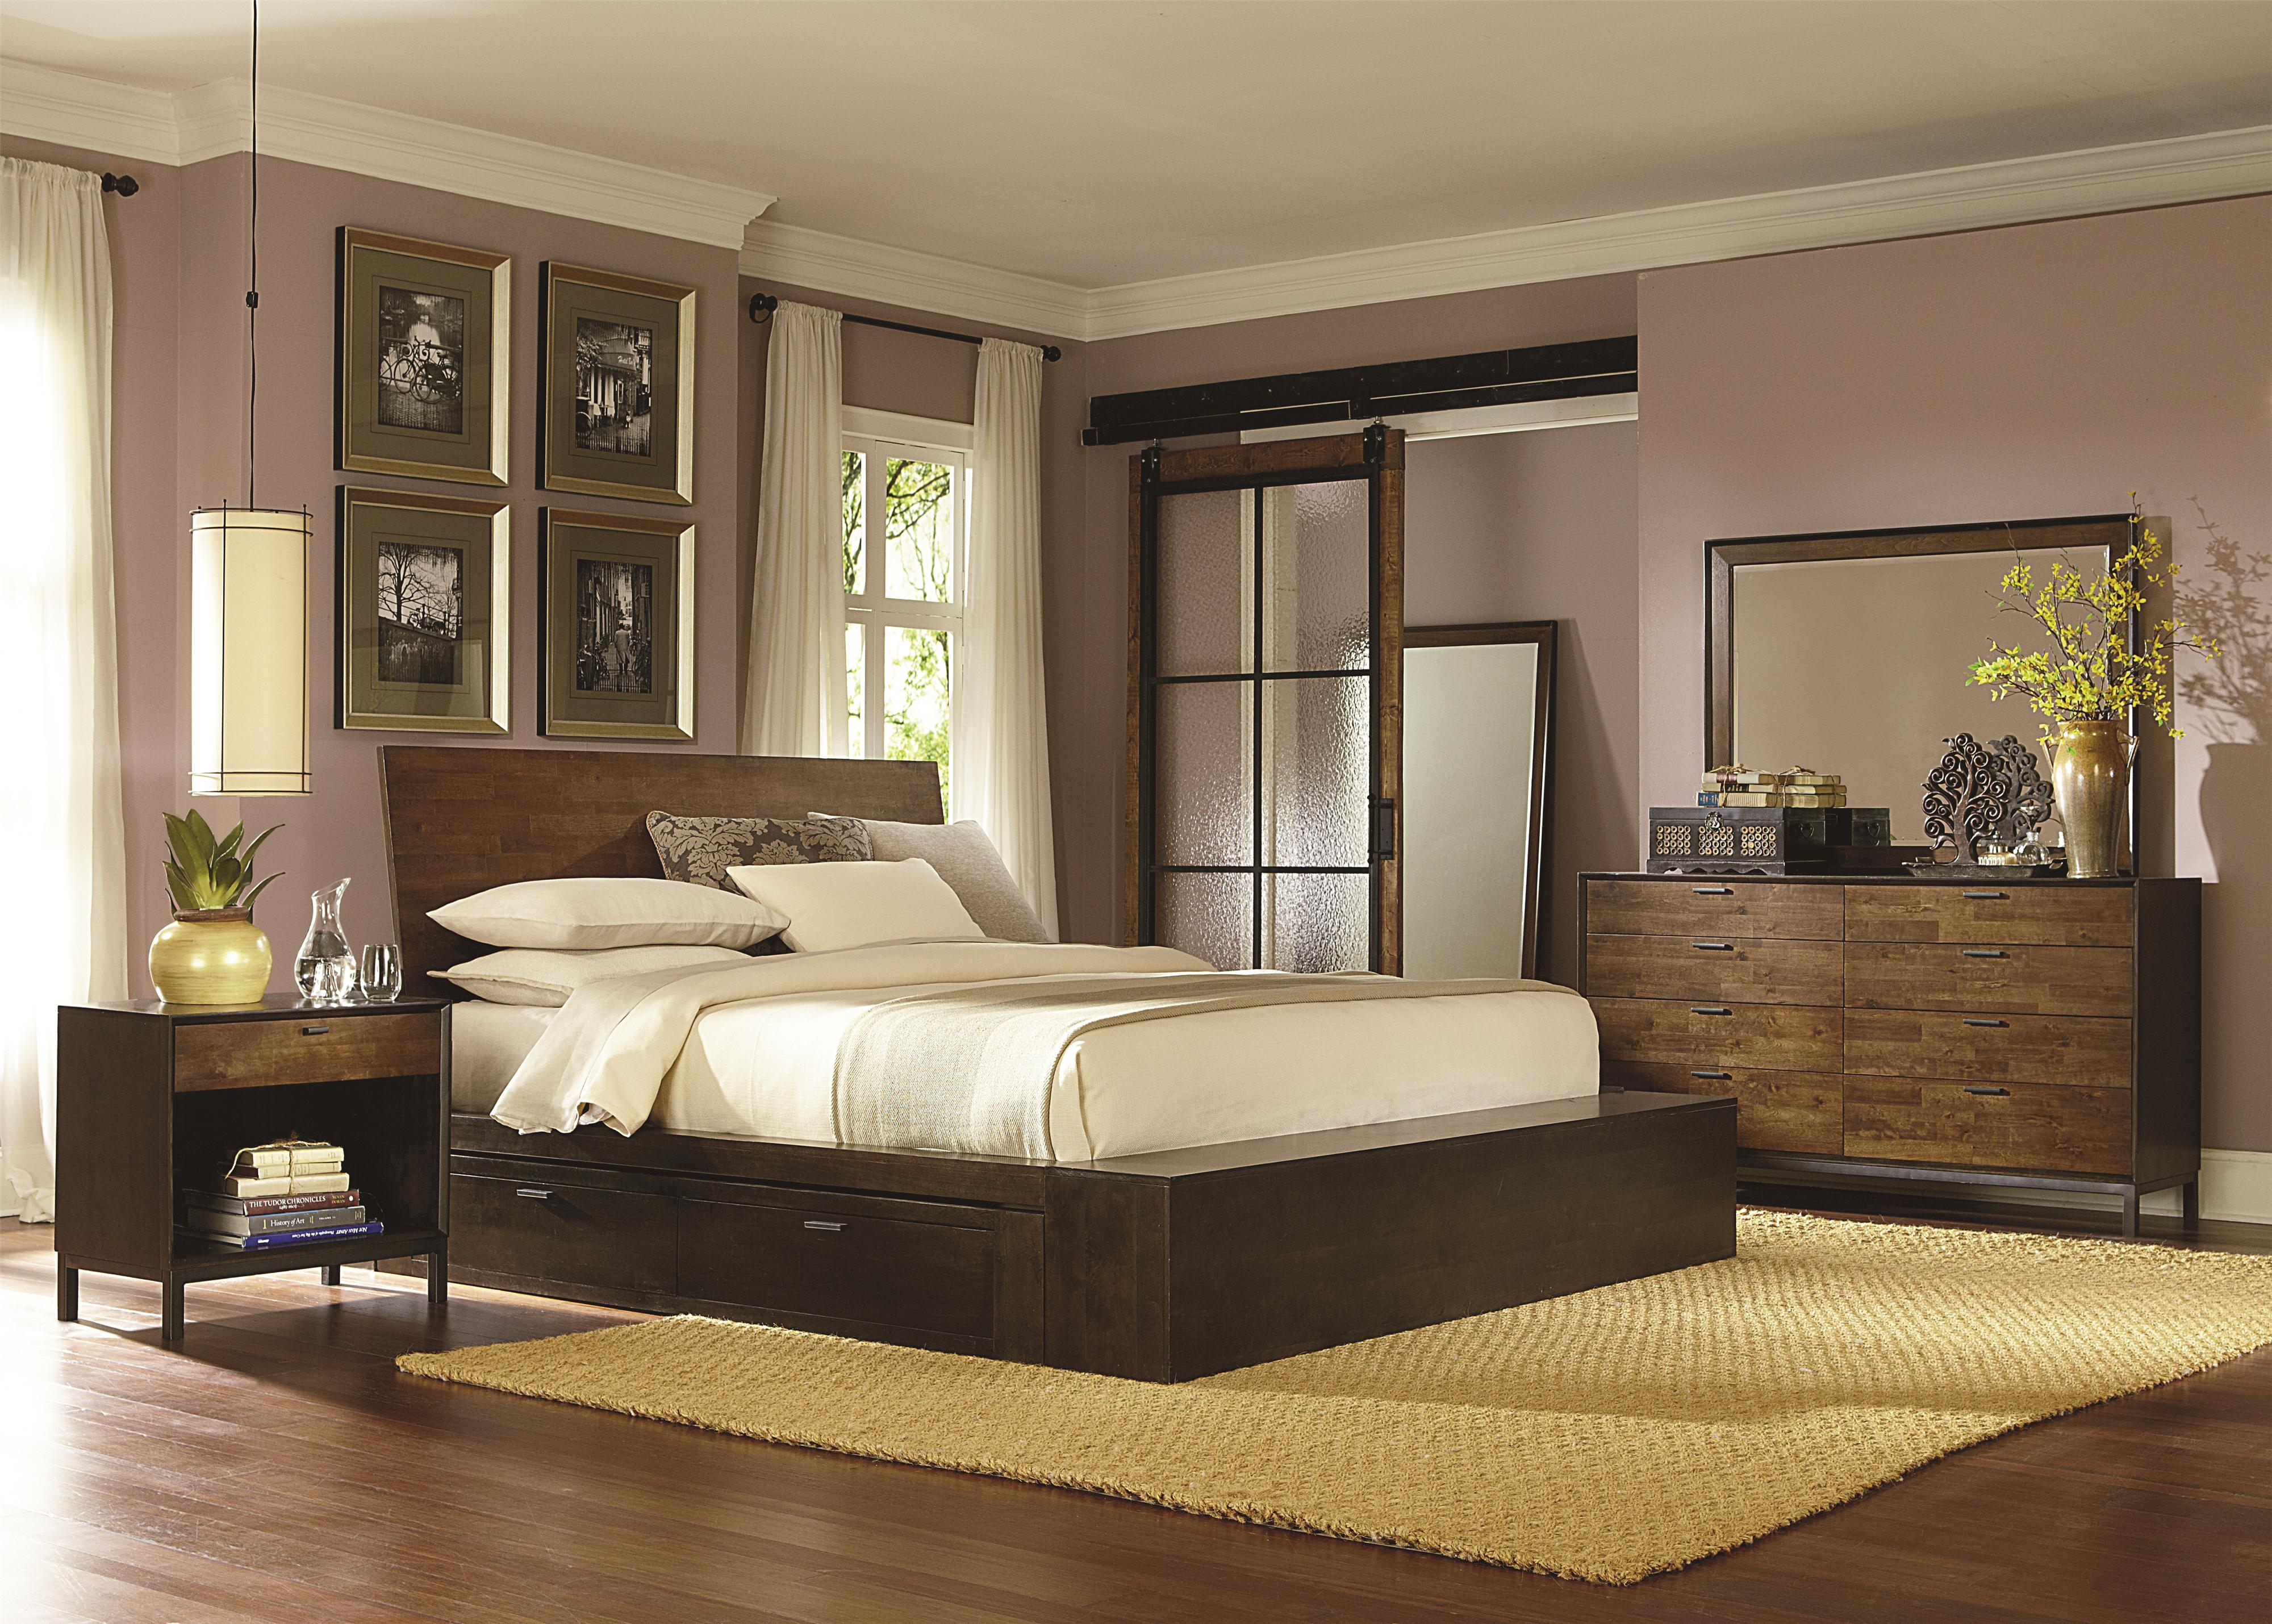 Legacy Classic Kateri King Platform Two Storage Bedroom Group - AHFA ...